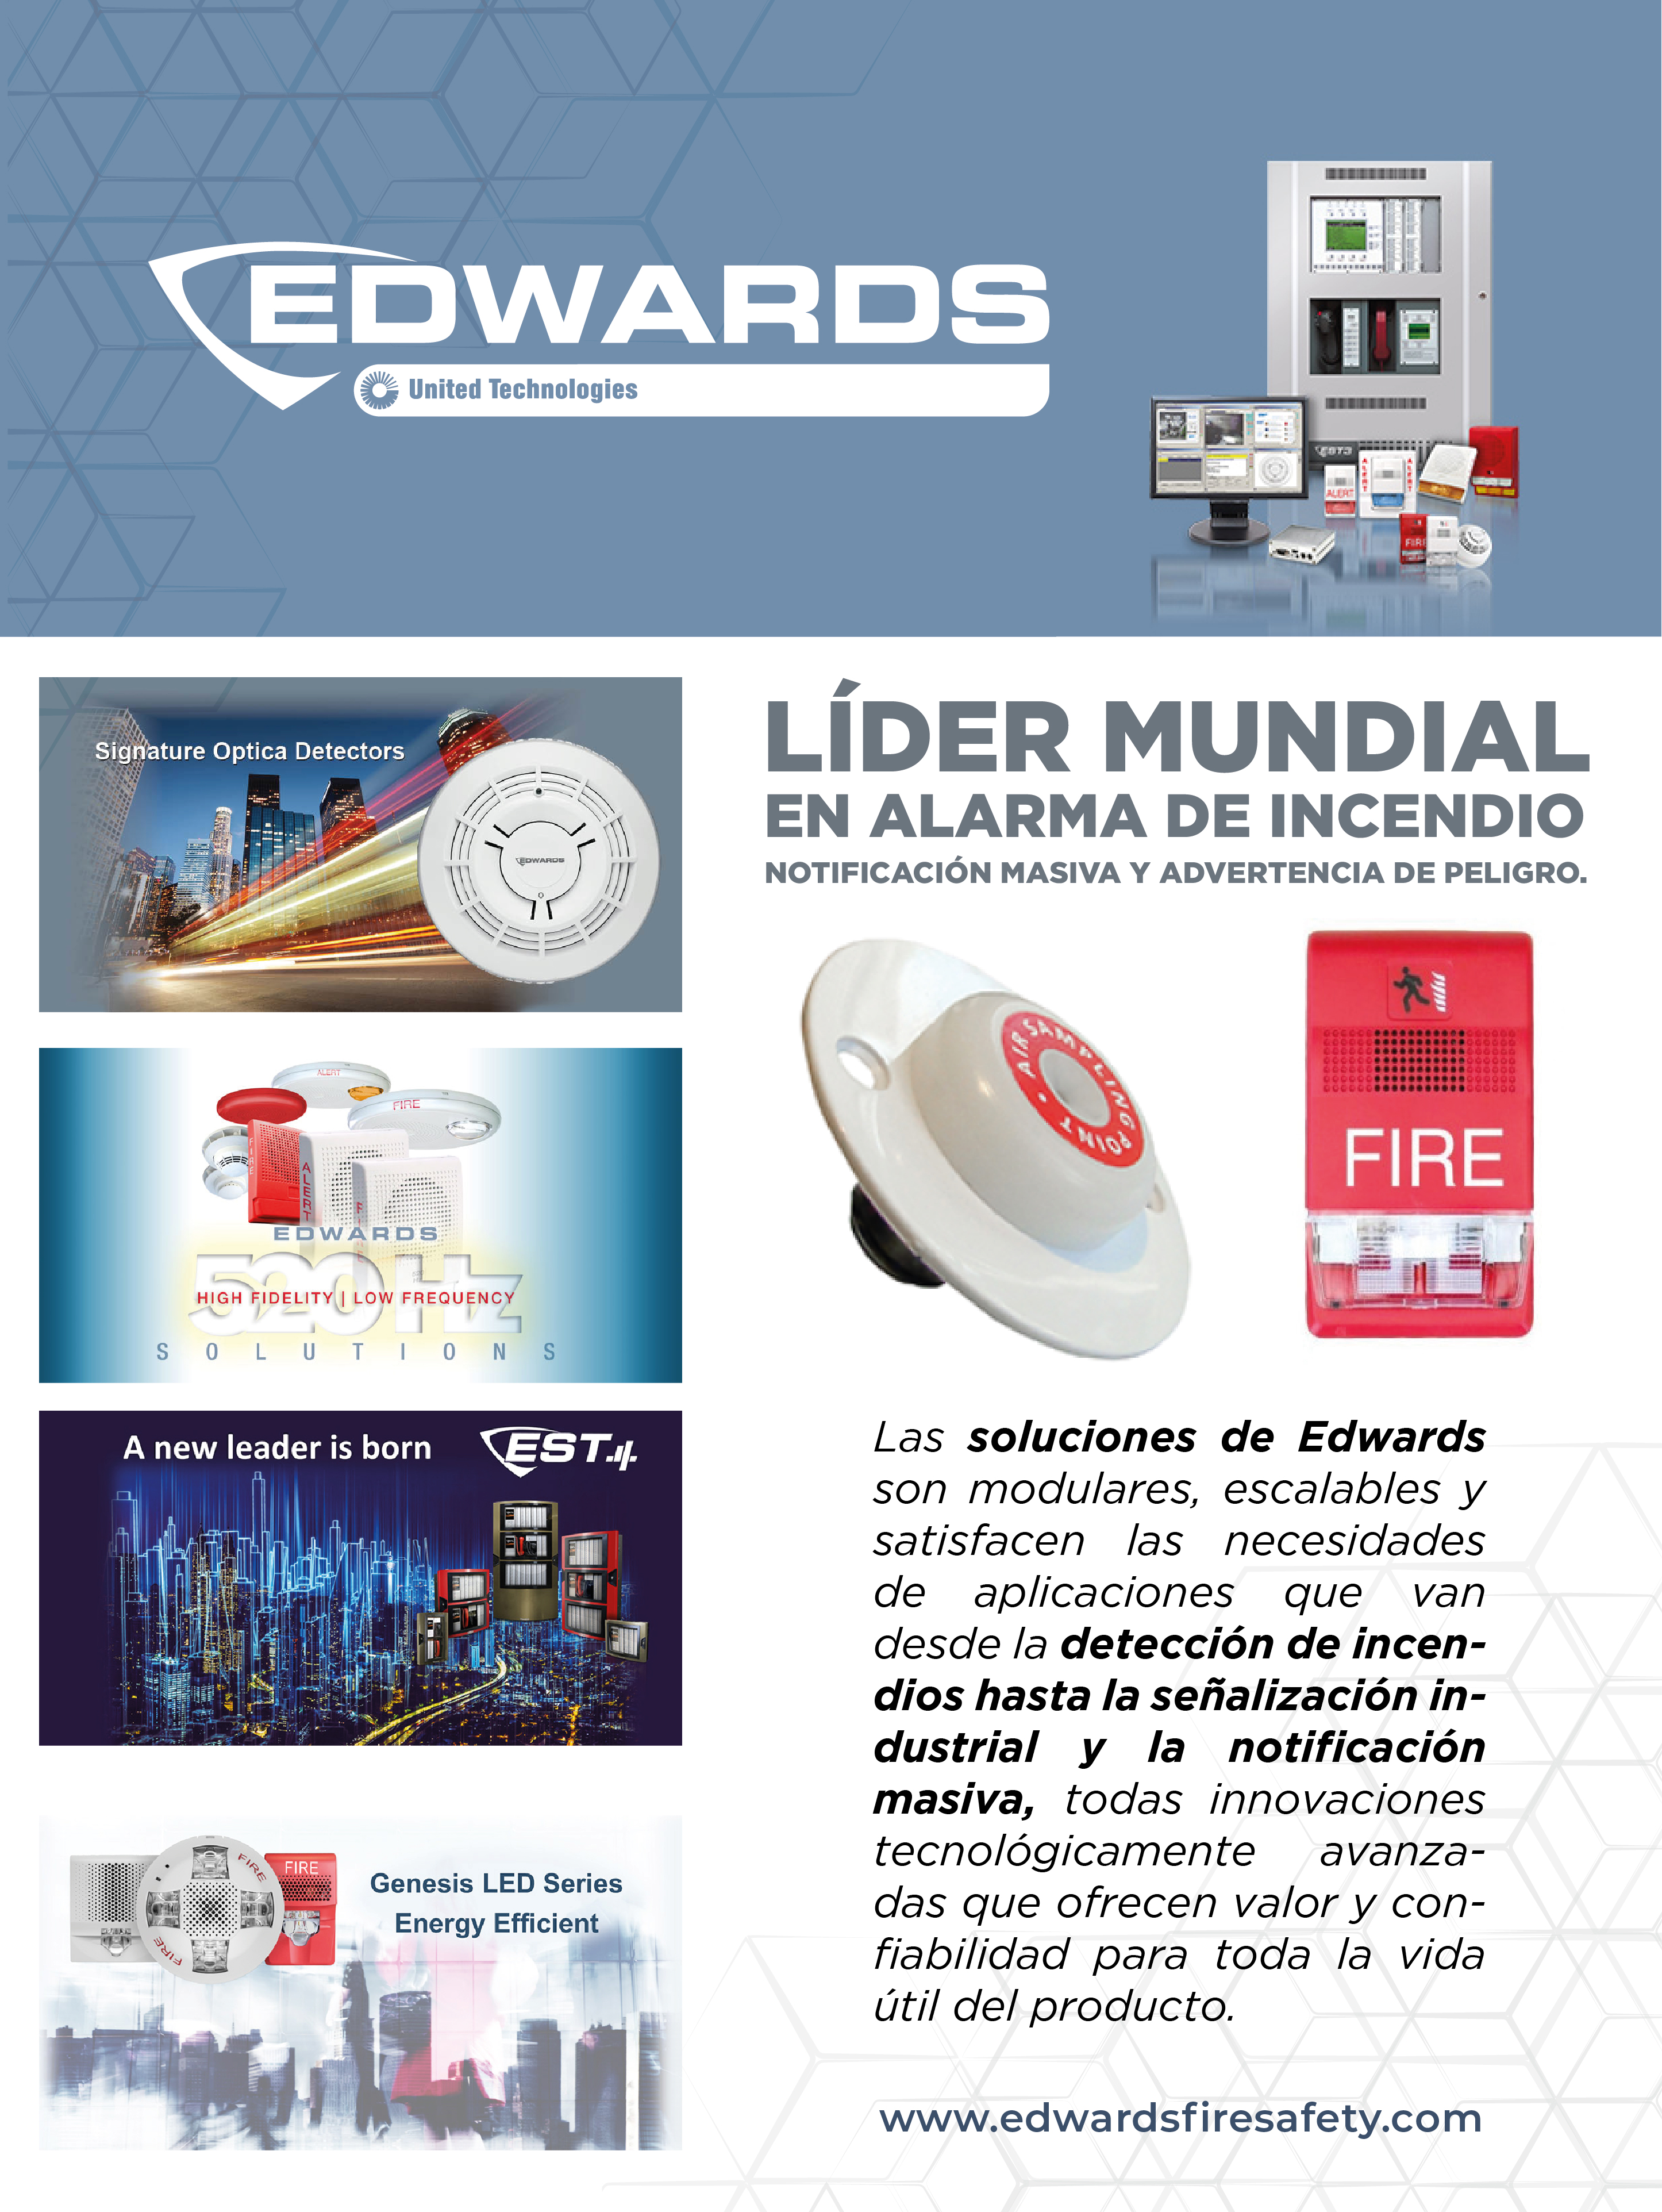 edwards1.jpg